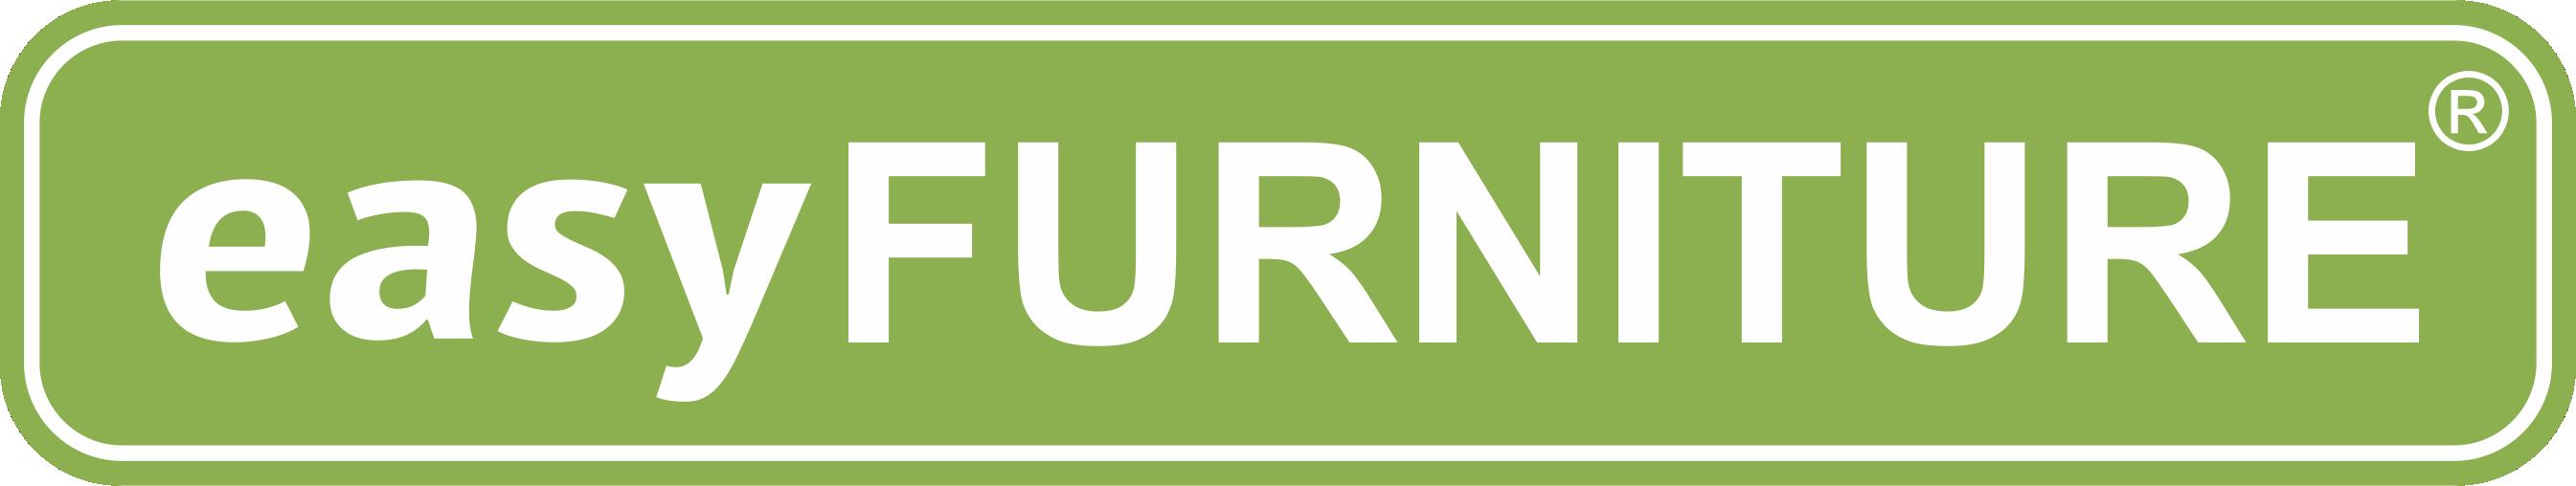 2 Drawer, 1 Door Narrow Storage Cabinet 031, solid pine wood, white - 122H x 40W x 47D cm